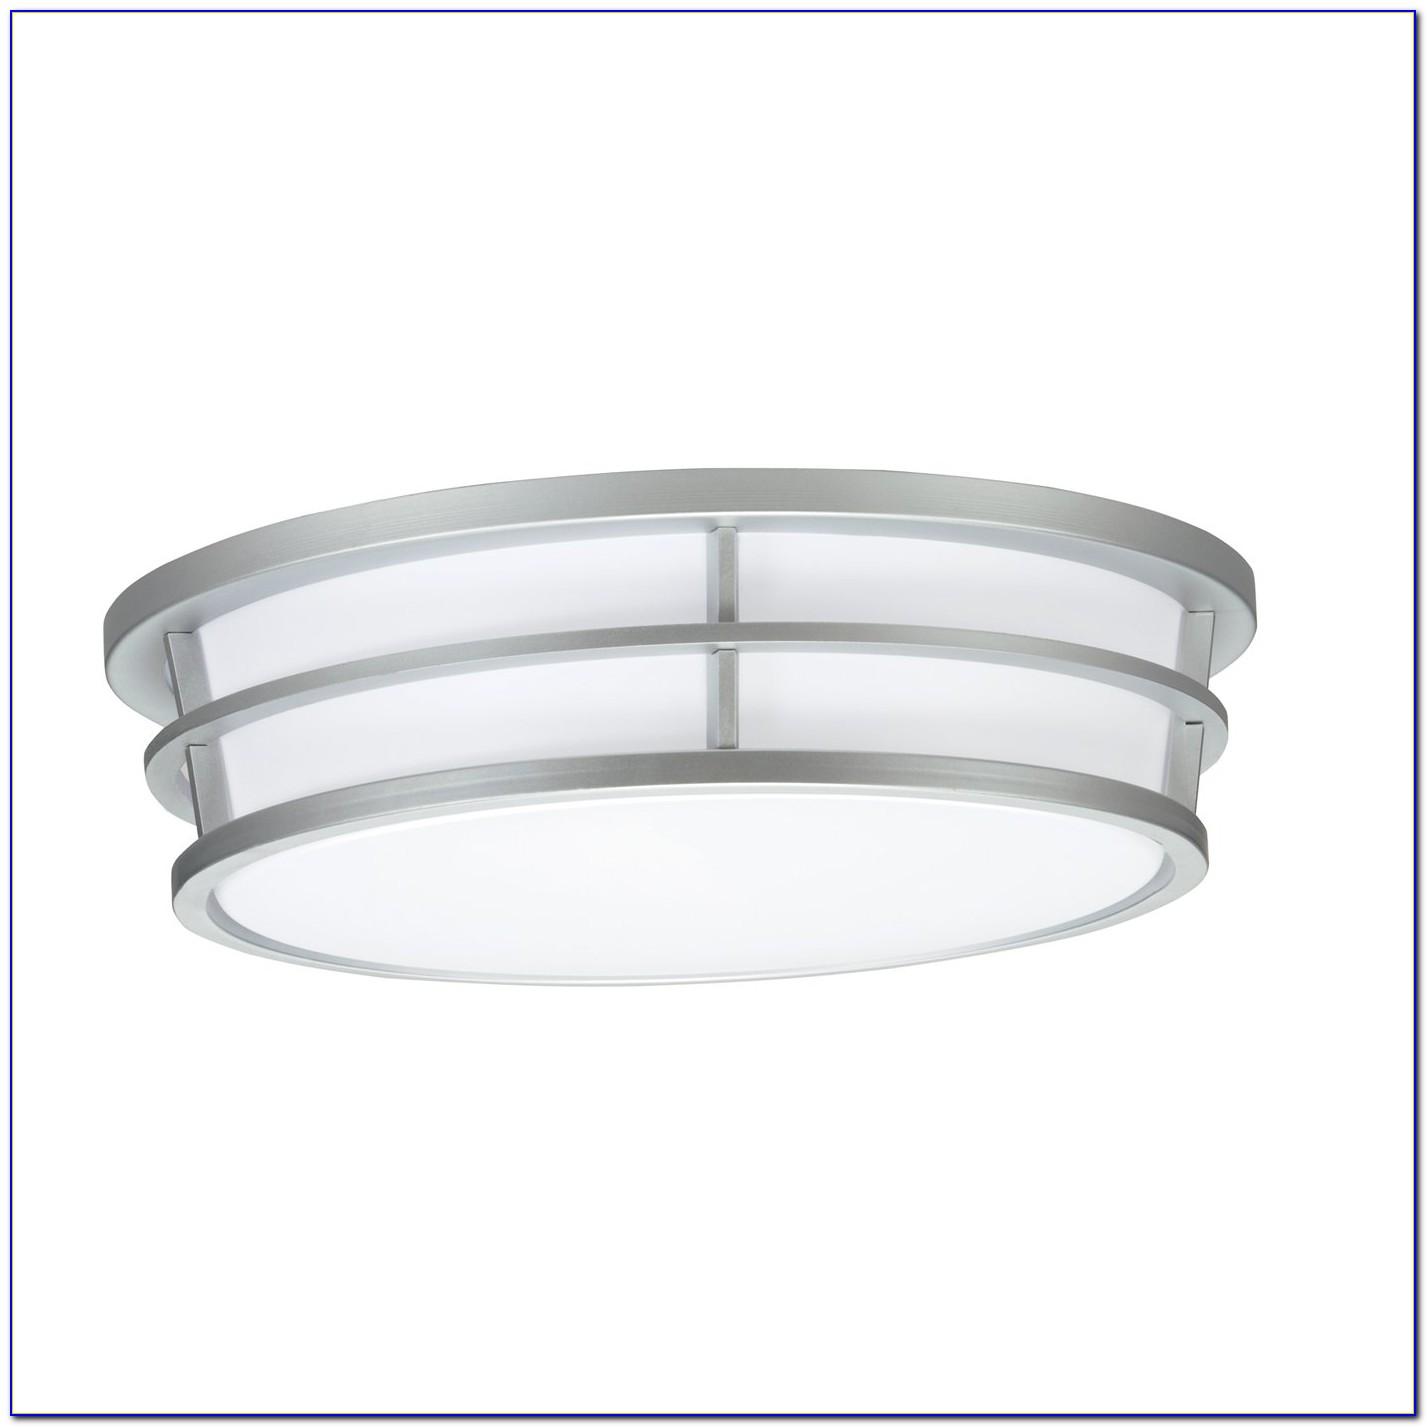 Round Fluorescent Ceiling Light Bulb